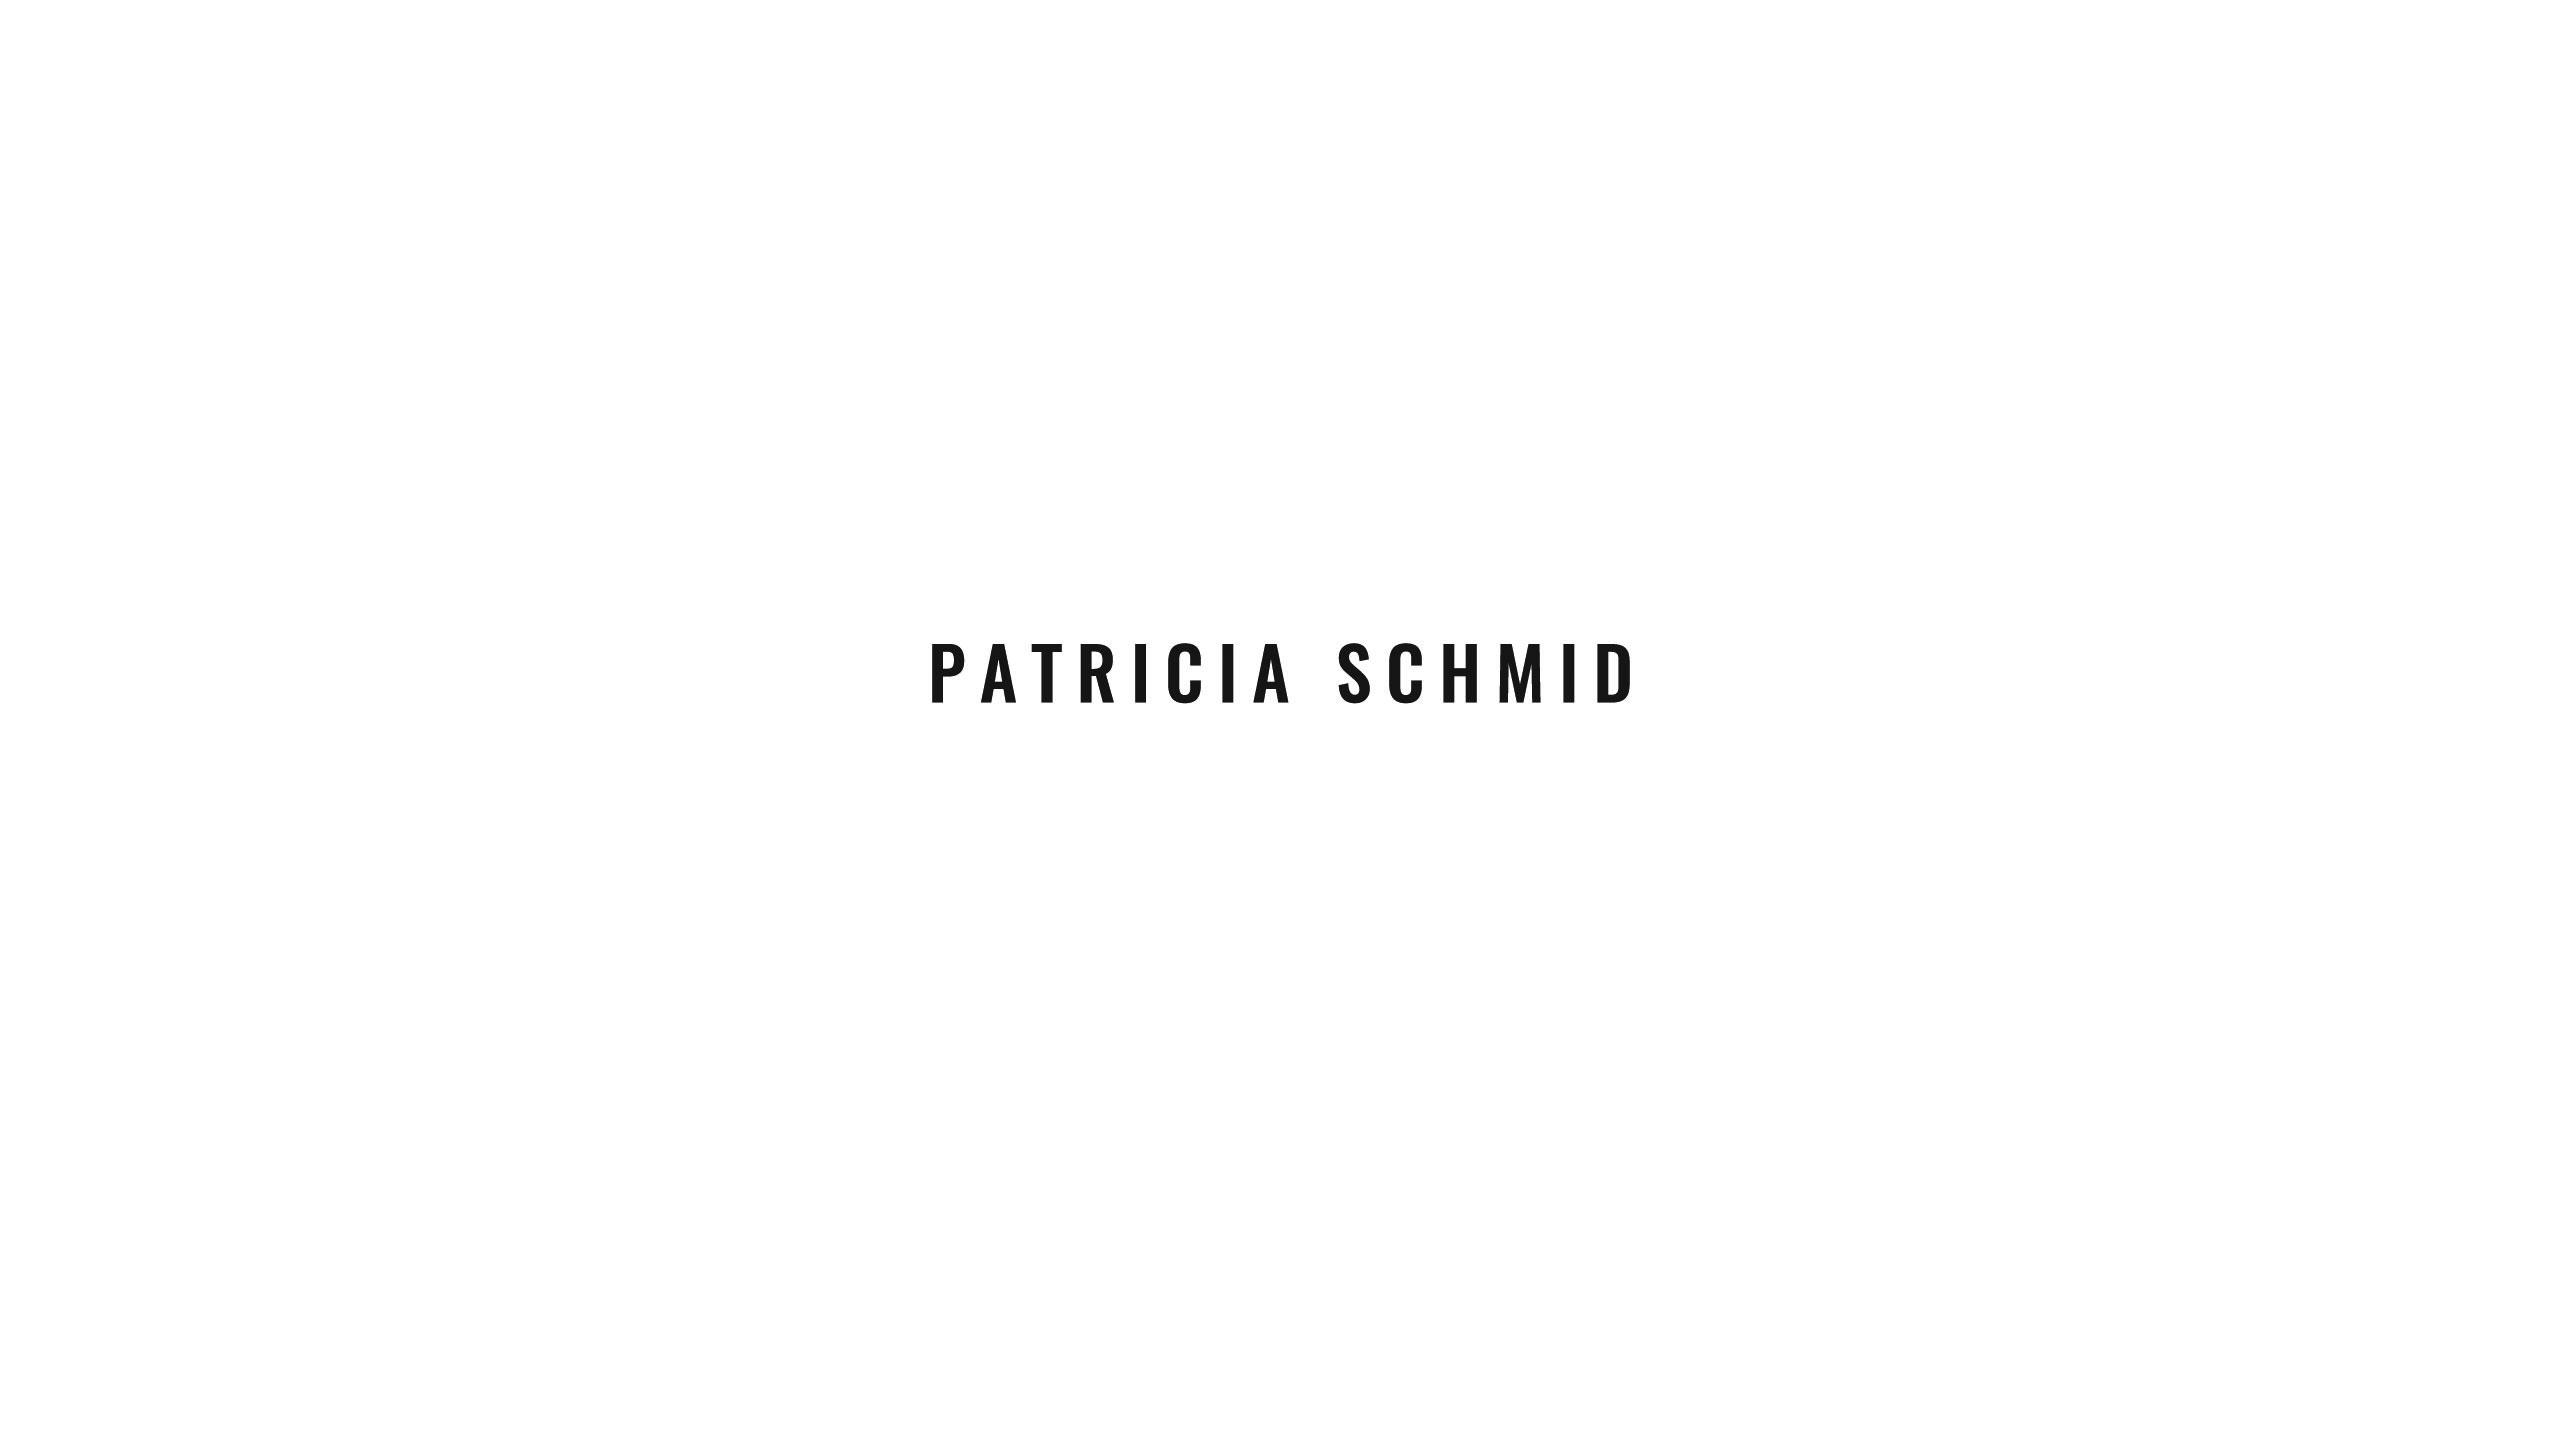 1a_Text_PATRICIA_SCHMID